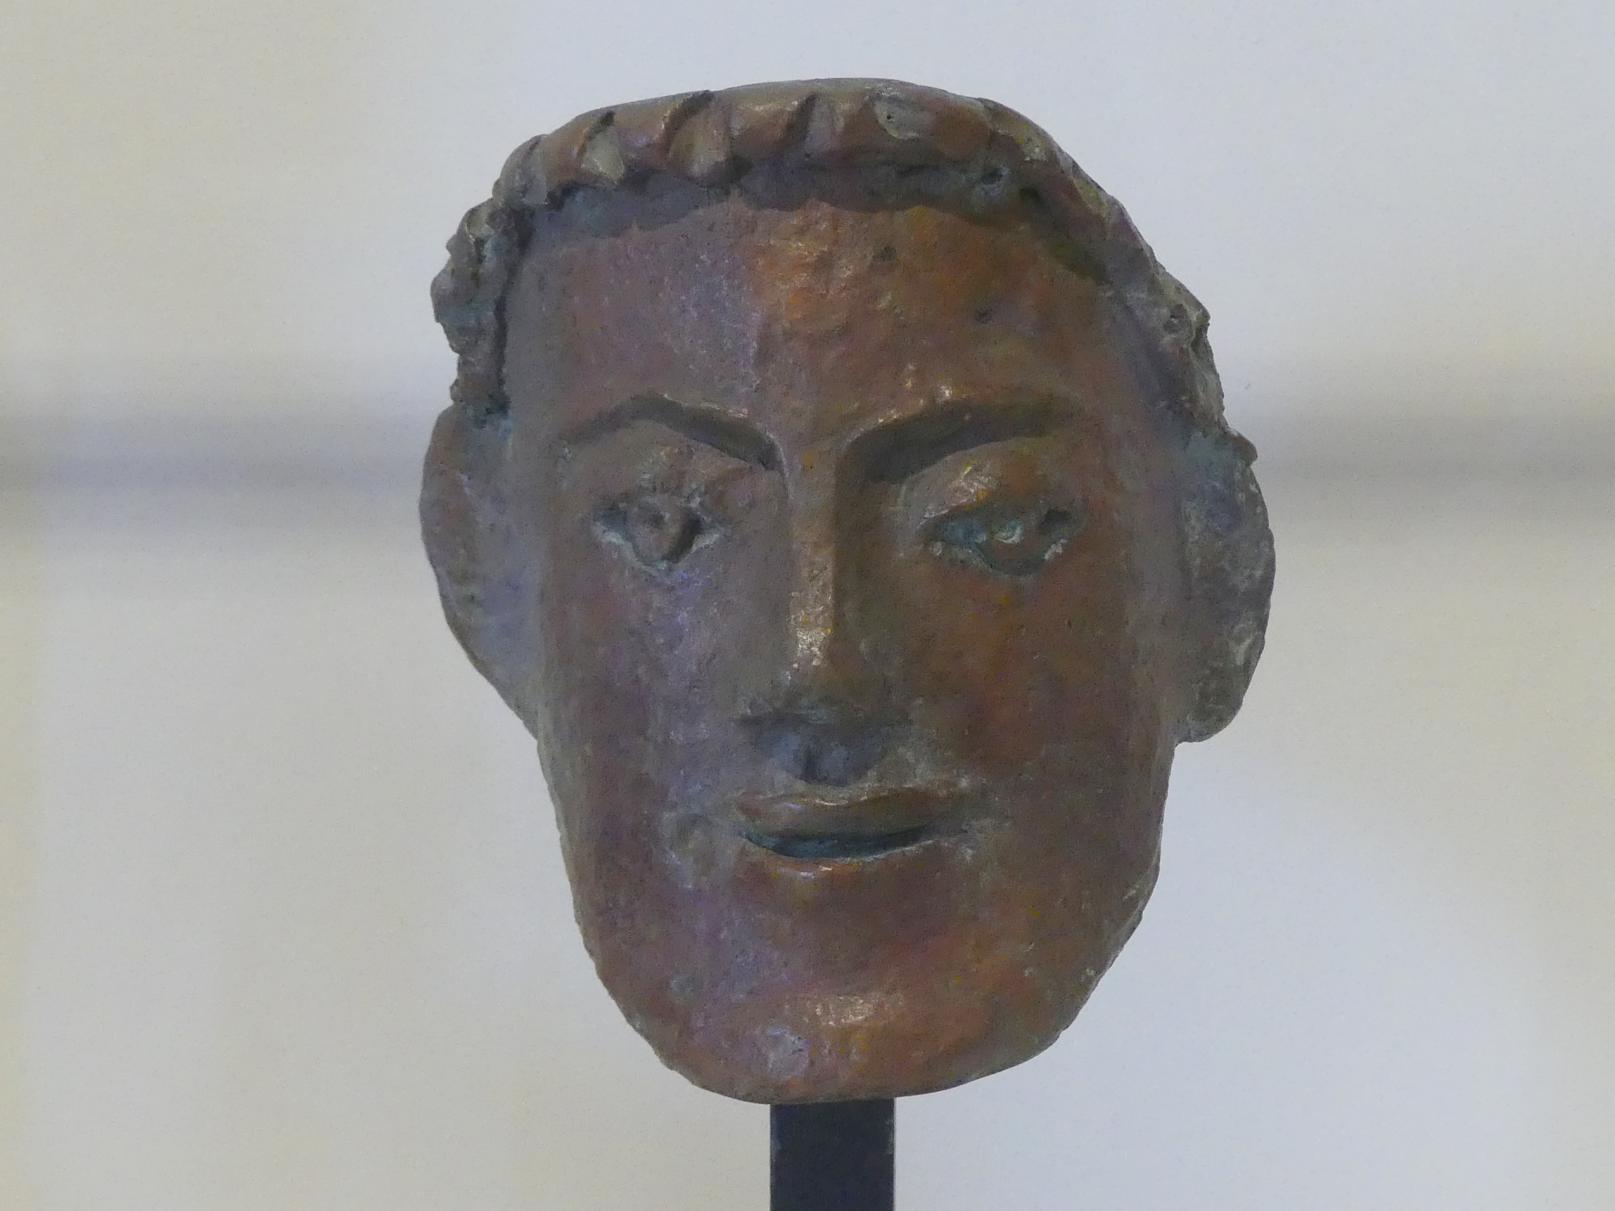 André Derain: Der schöne Jüngling, 1938 - 1950